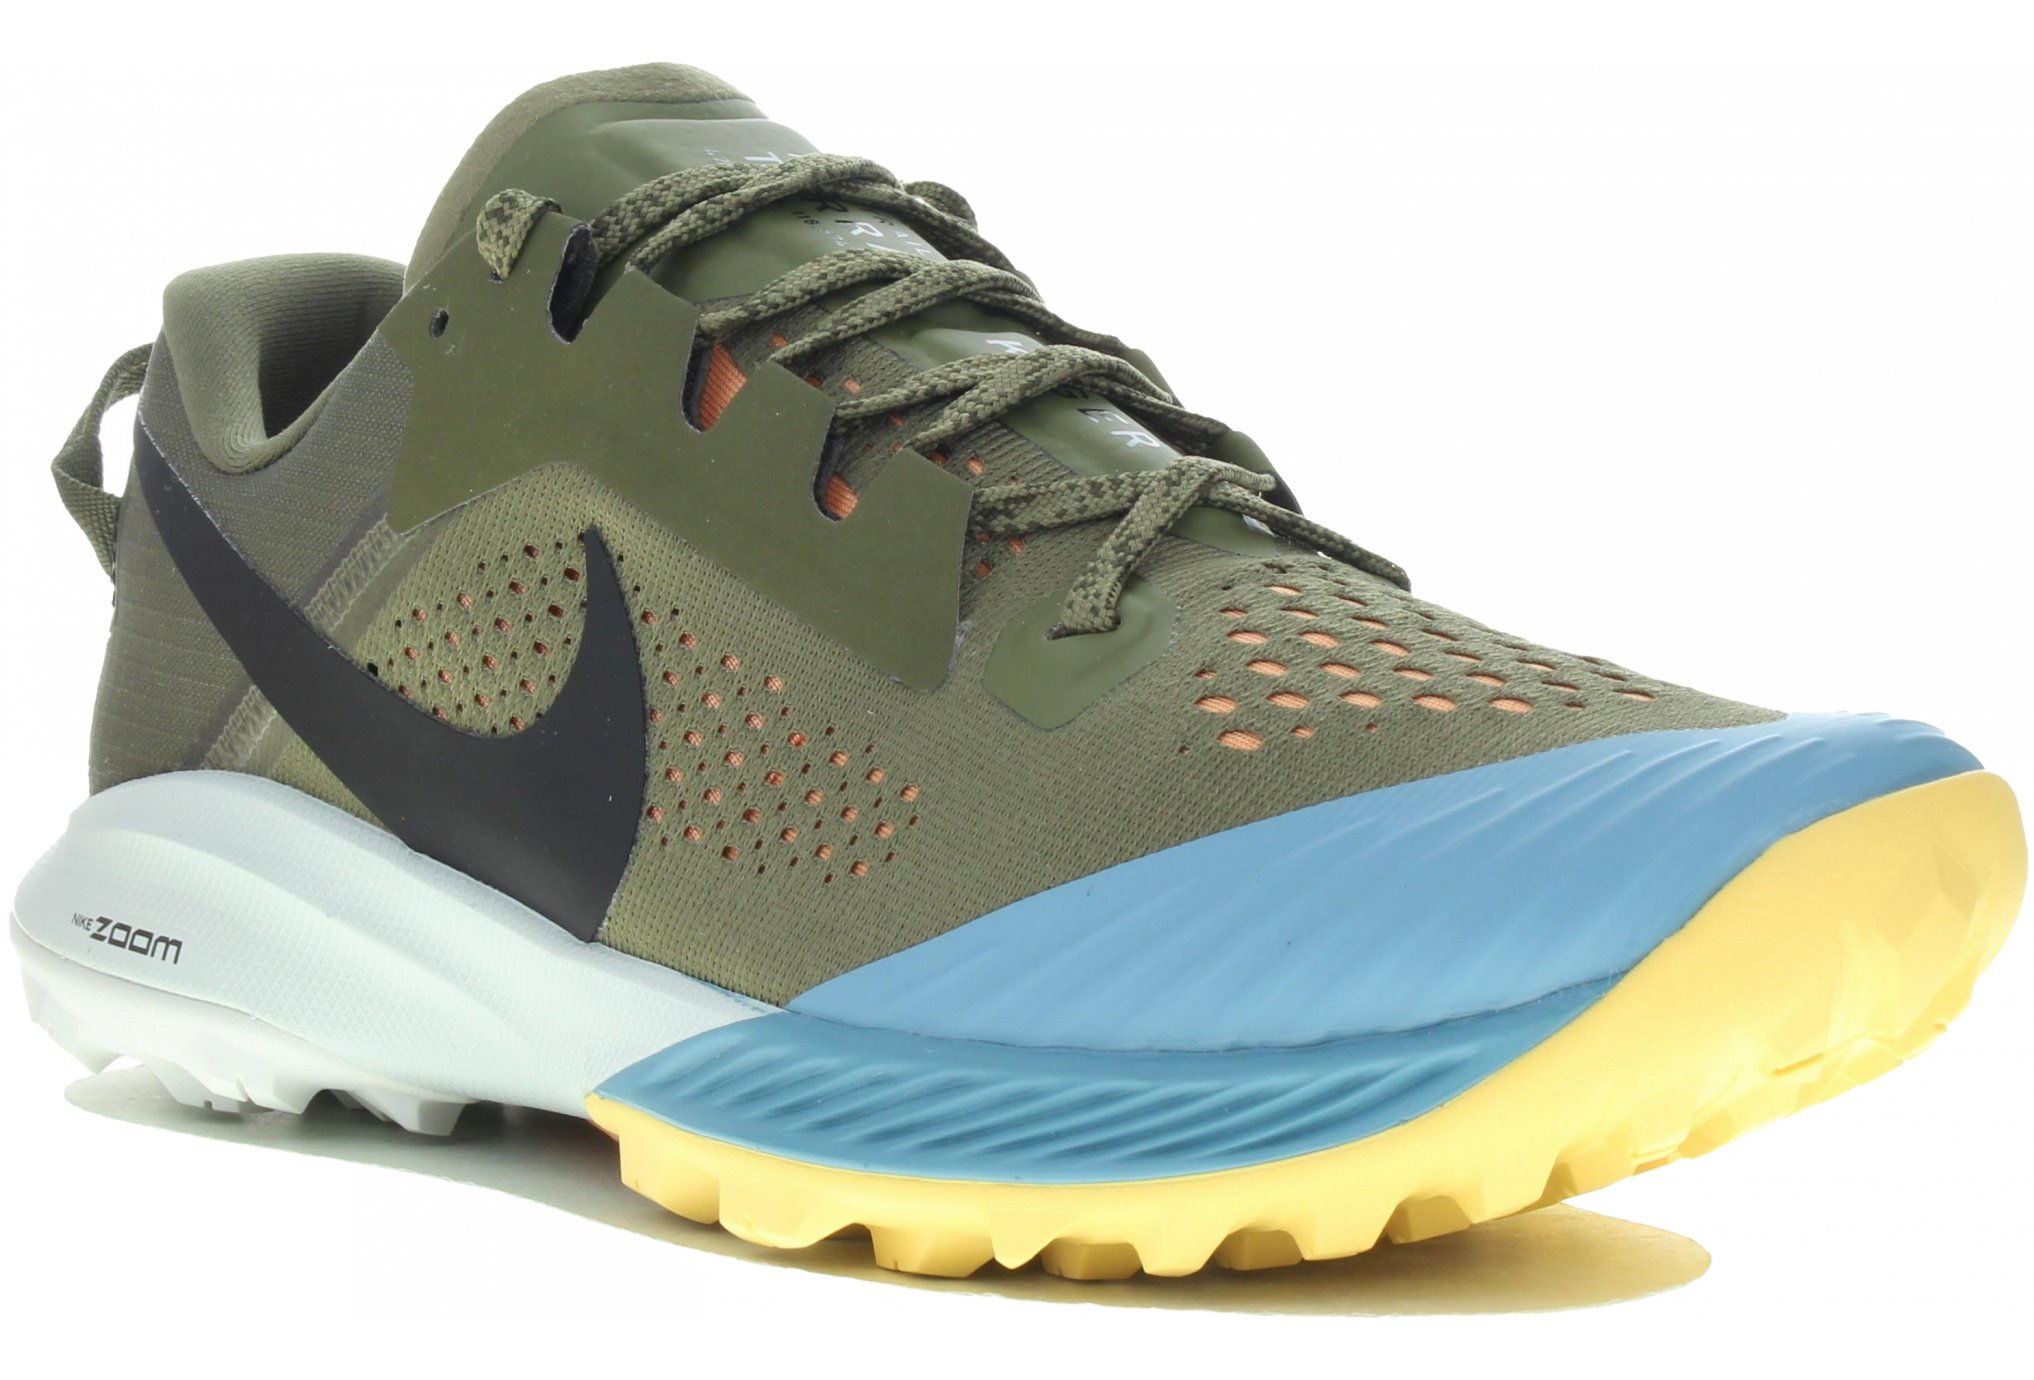 Nike Air Zoom Terra Kiger 6 Chaussures homme